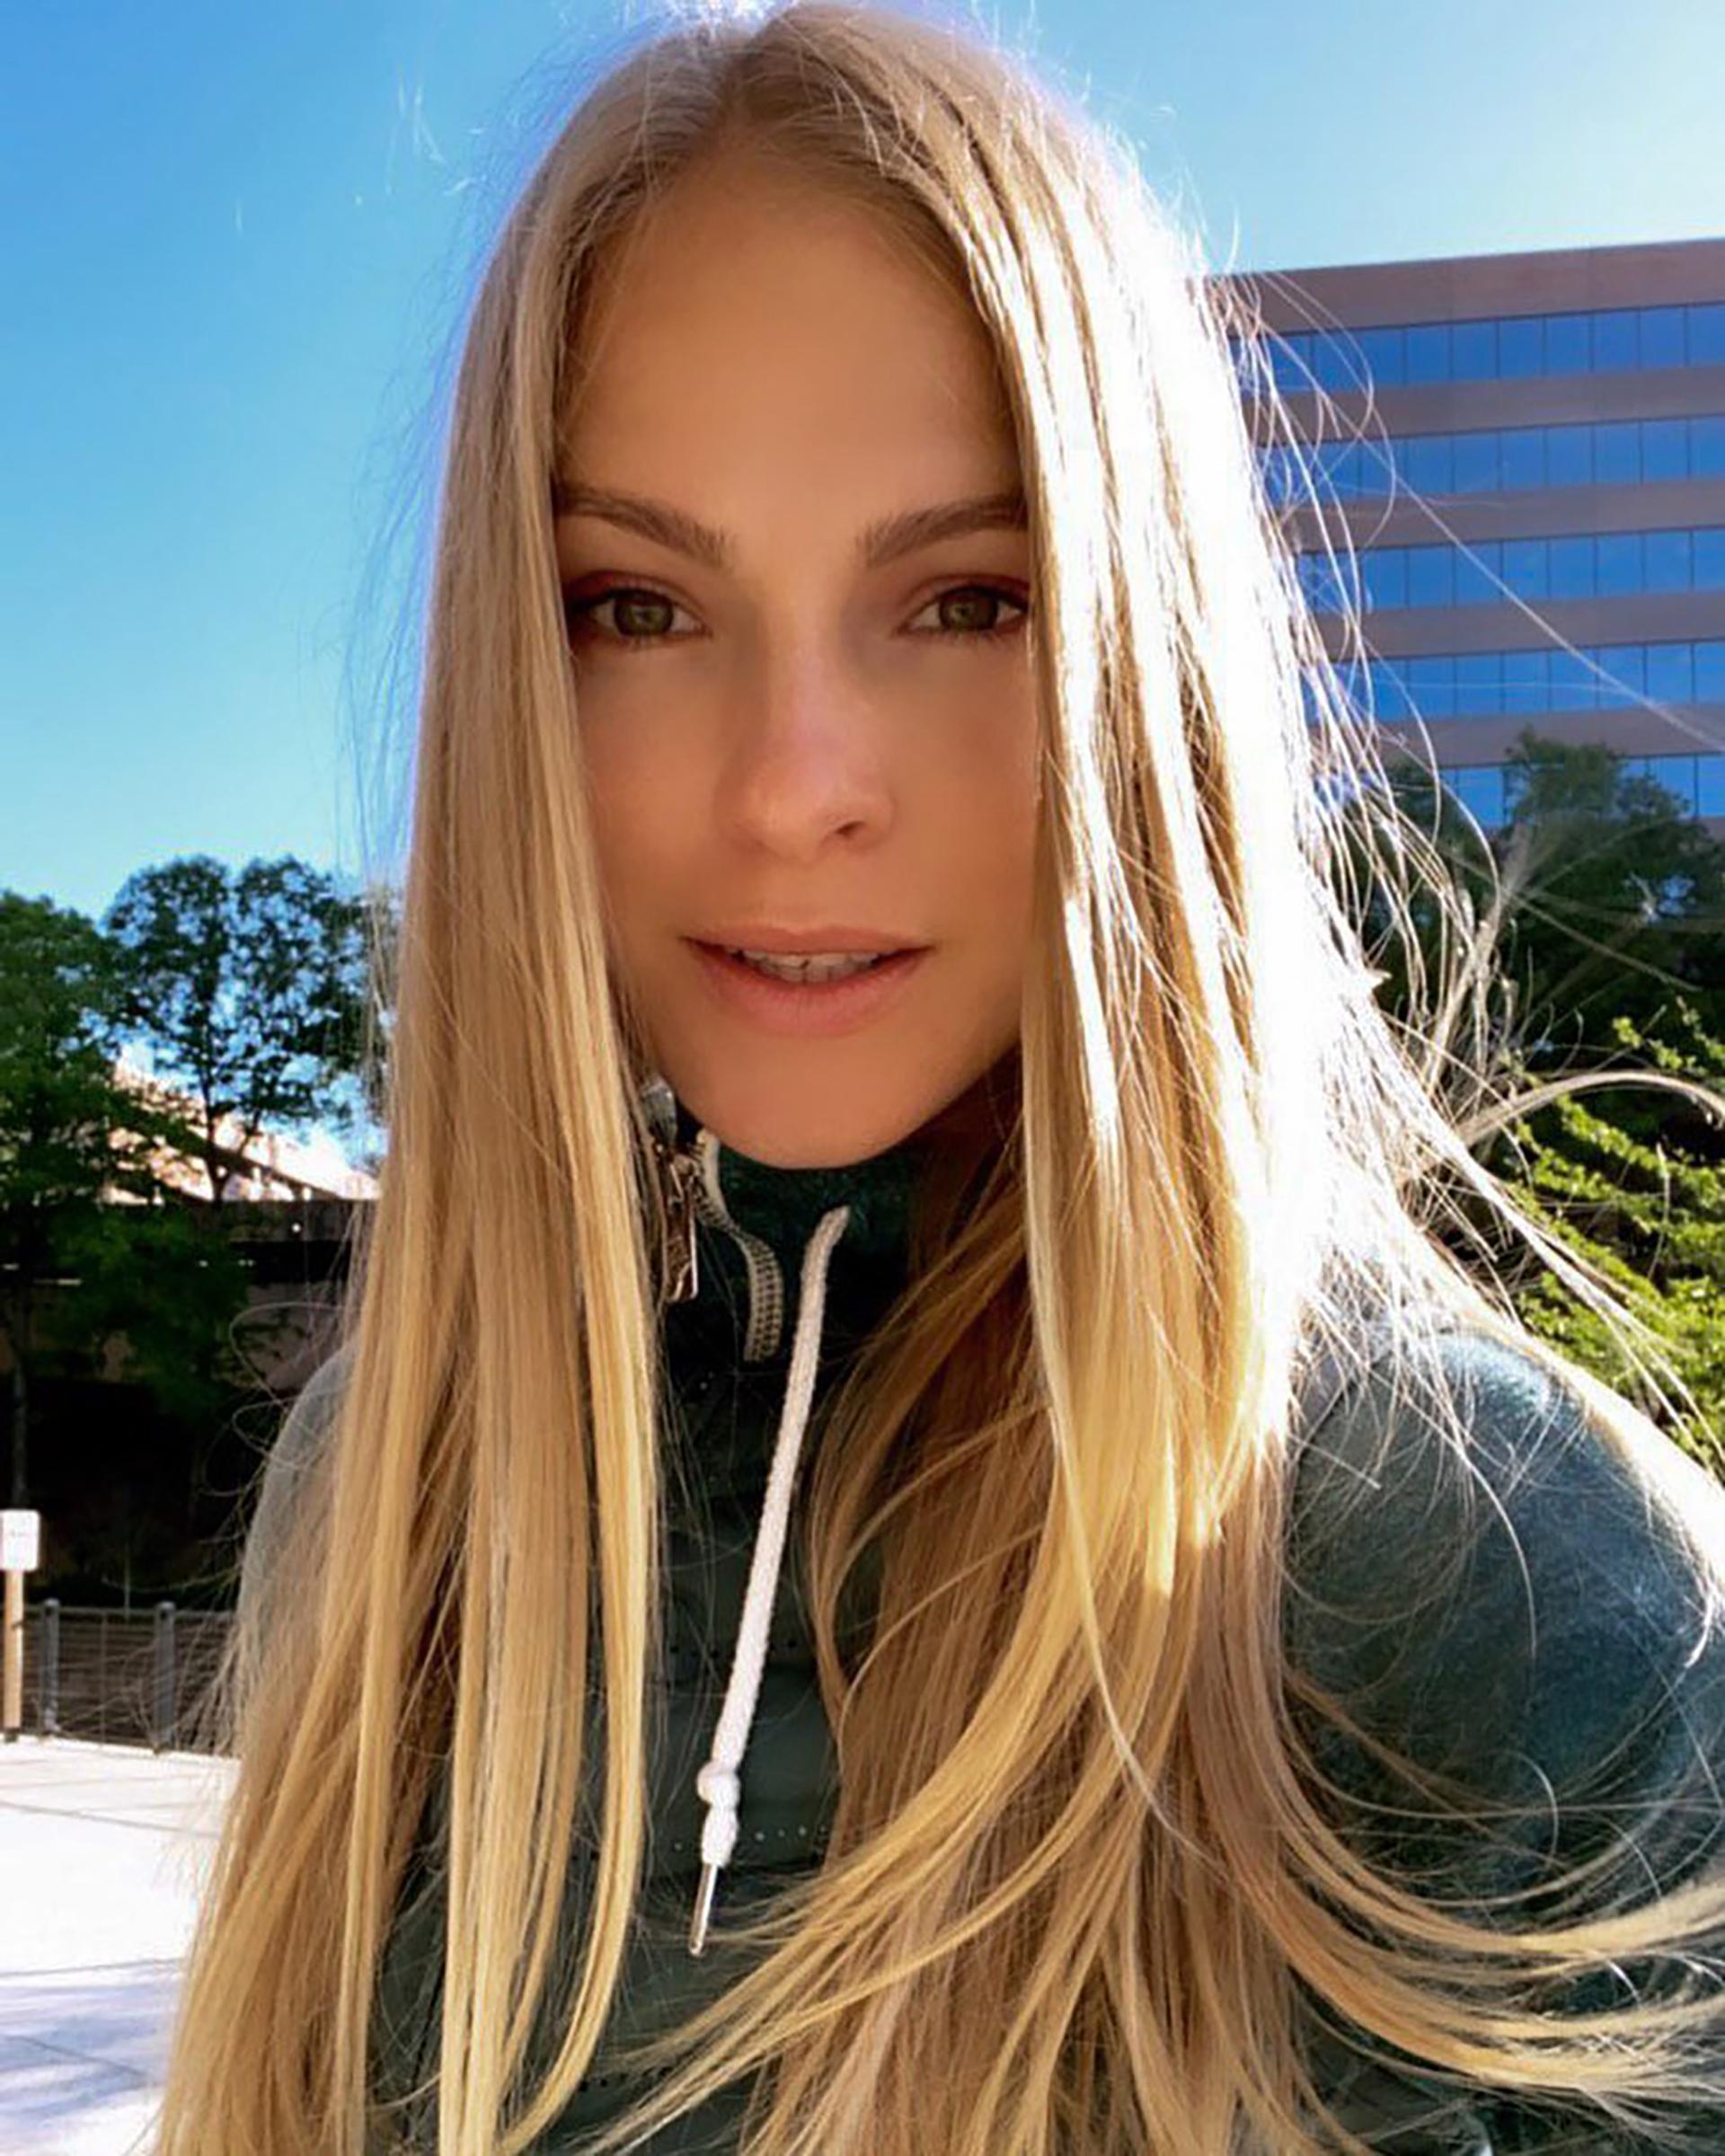 Klishina vive en Estados Unidos (IG: @dariaklishina)